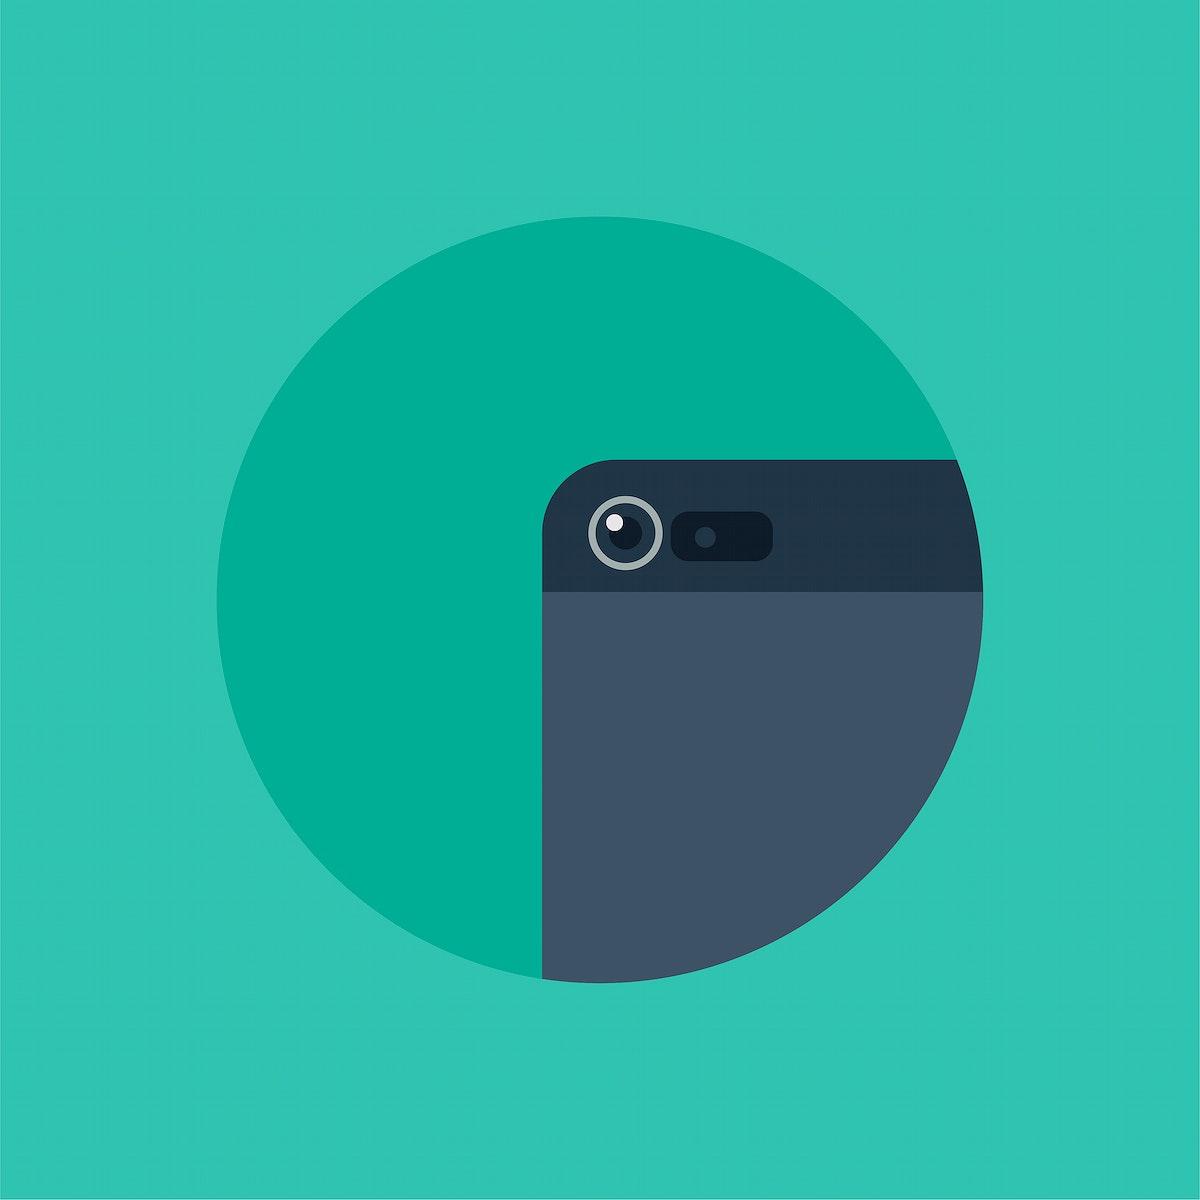 Vector of smartphone camera